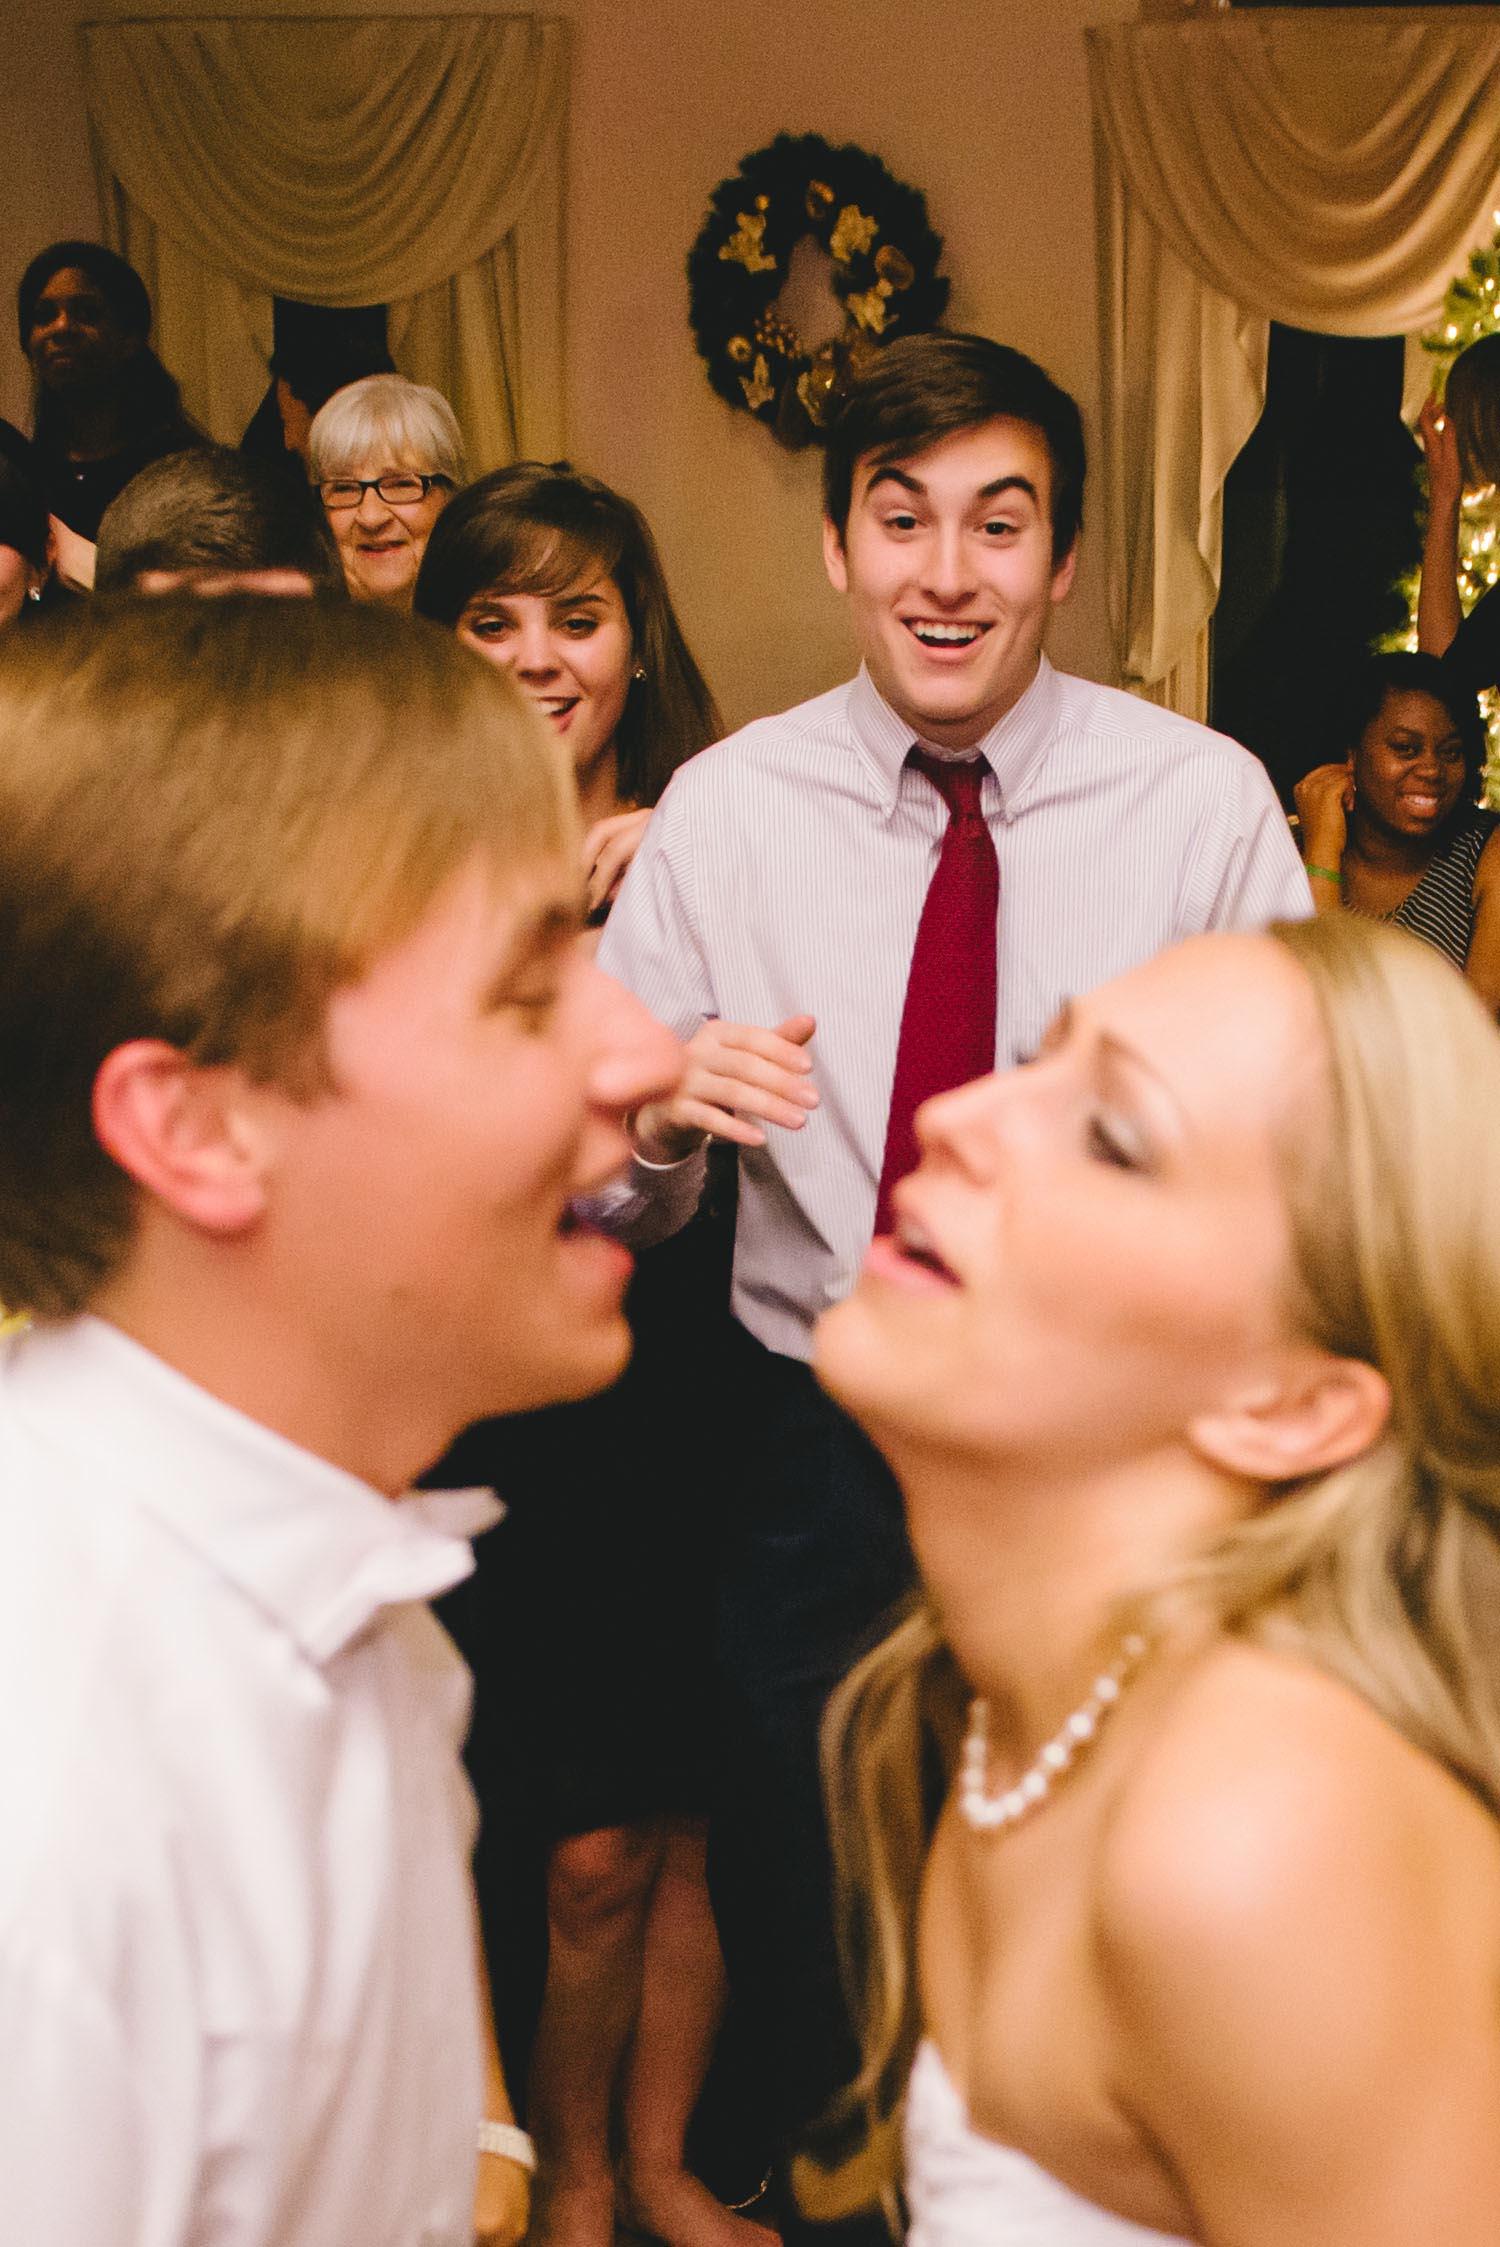 youngstrom-wedding-165.jpg